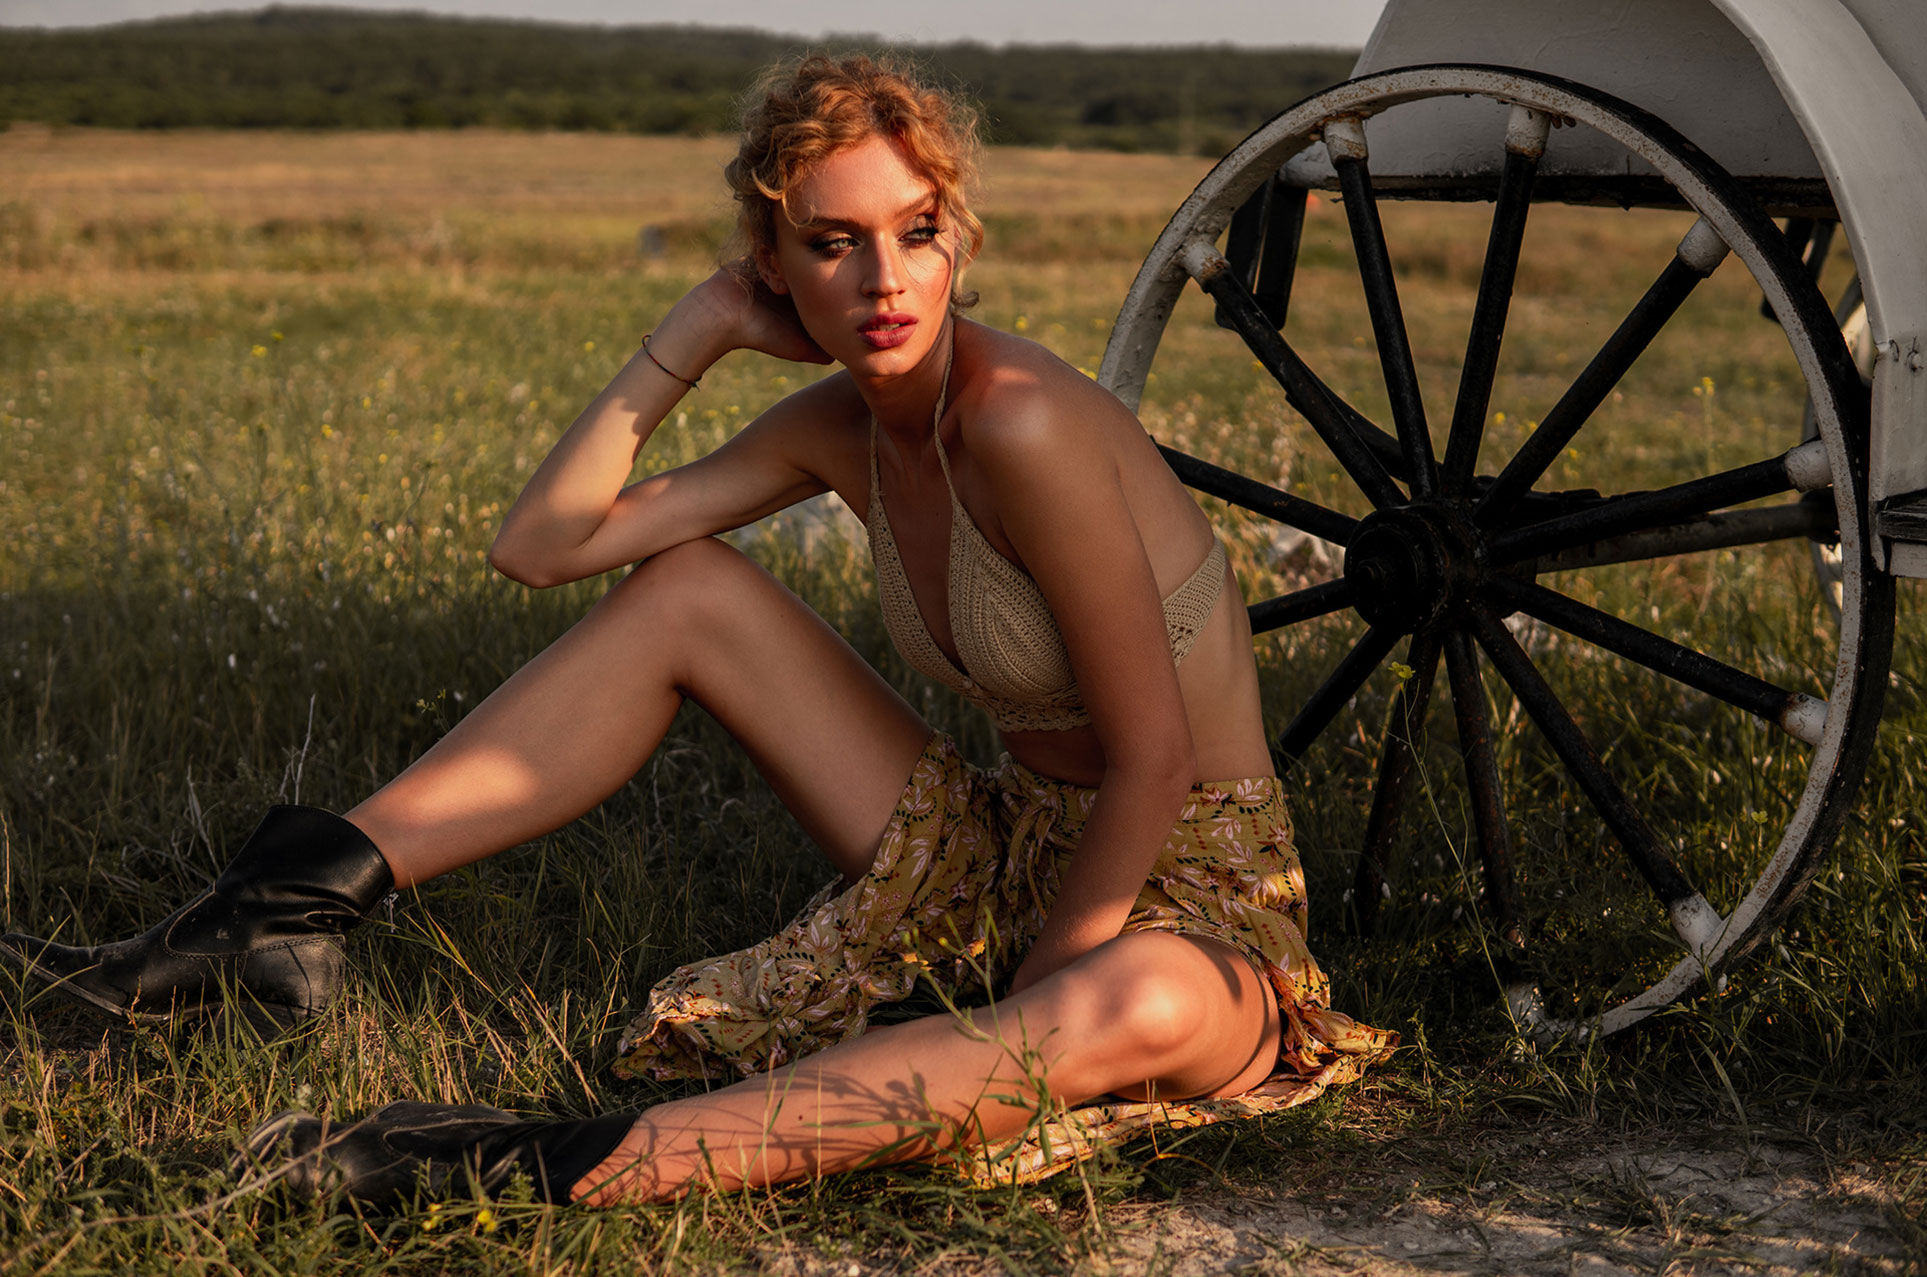 Девушка и лошадь / Даша Степанова в журнале Picton / фото 07